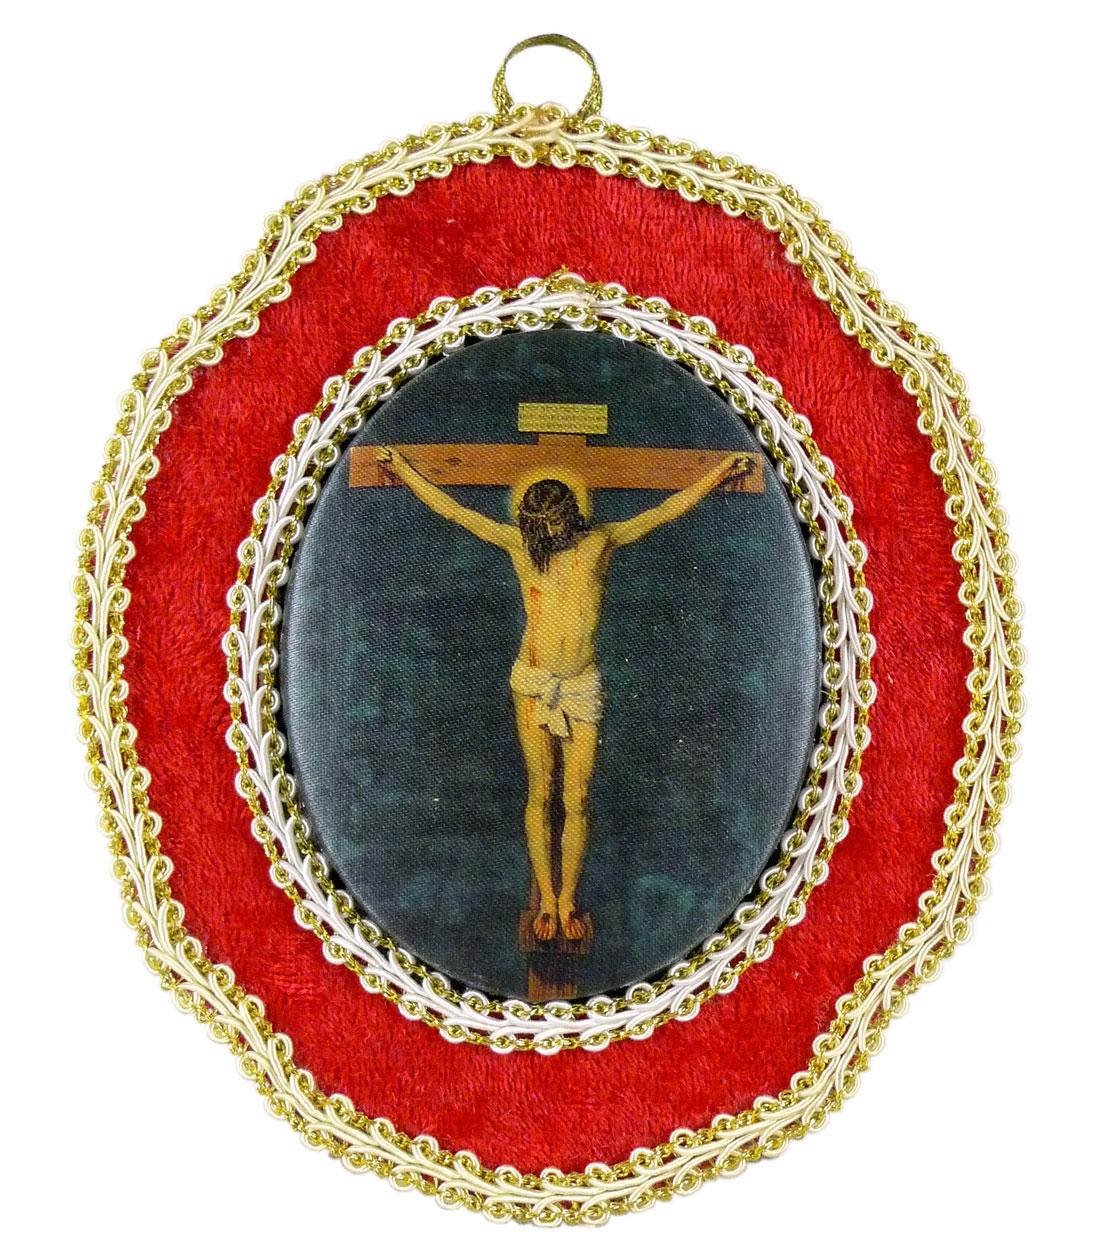 Bild, Jesus am Kreuz, Handarbeit